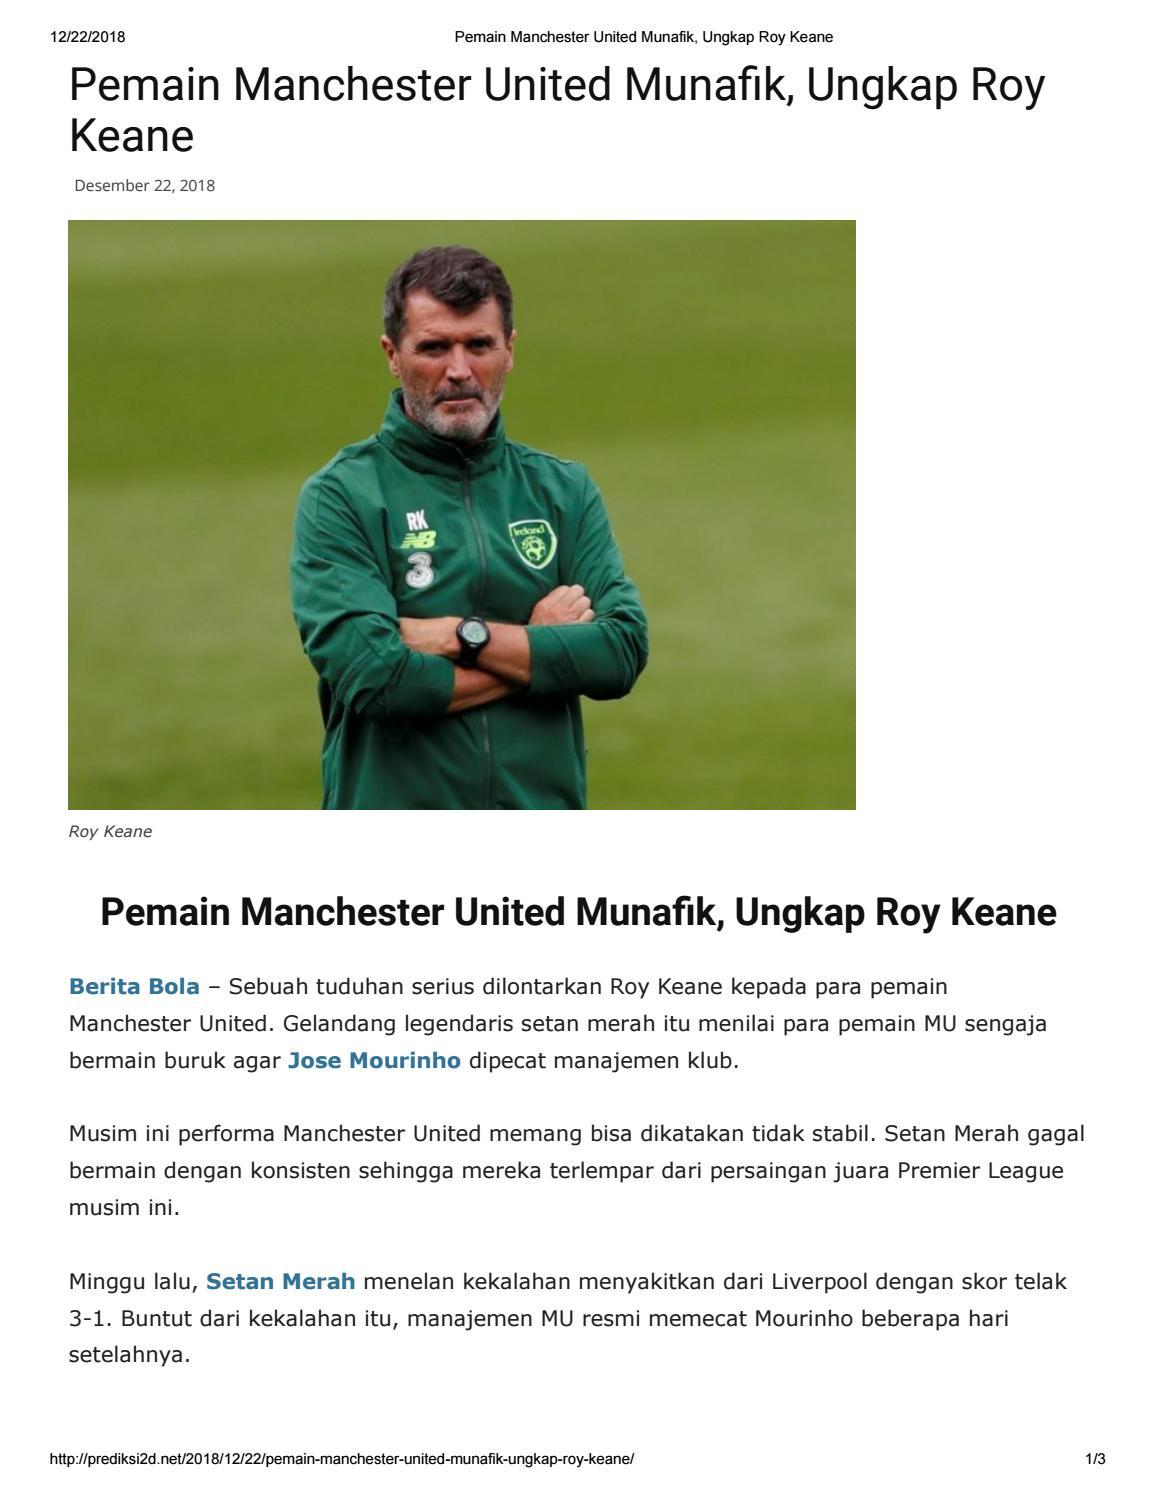 Pemain Manchester United Munafik Ungkap Roy Keane By